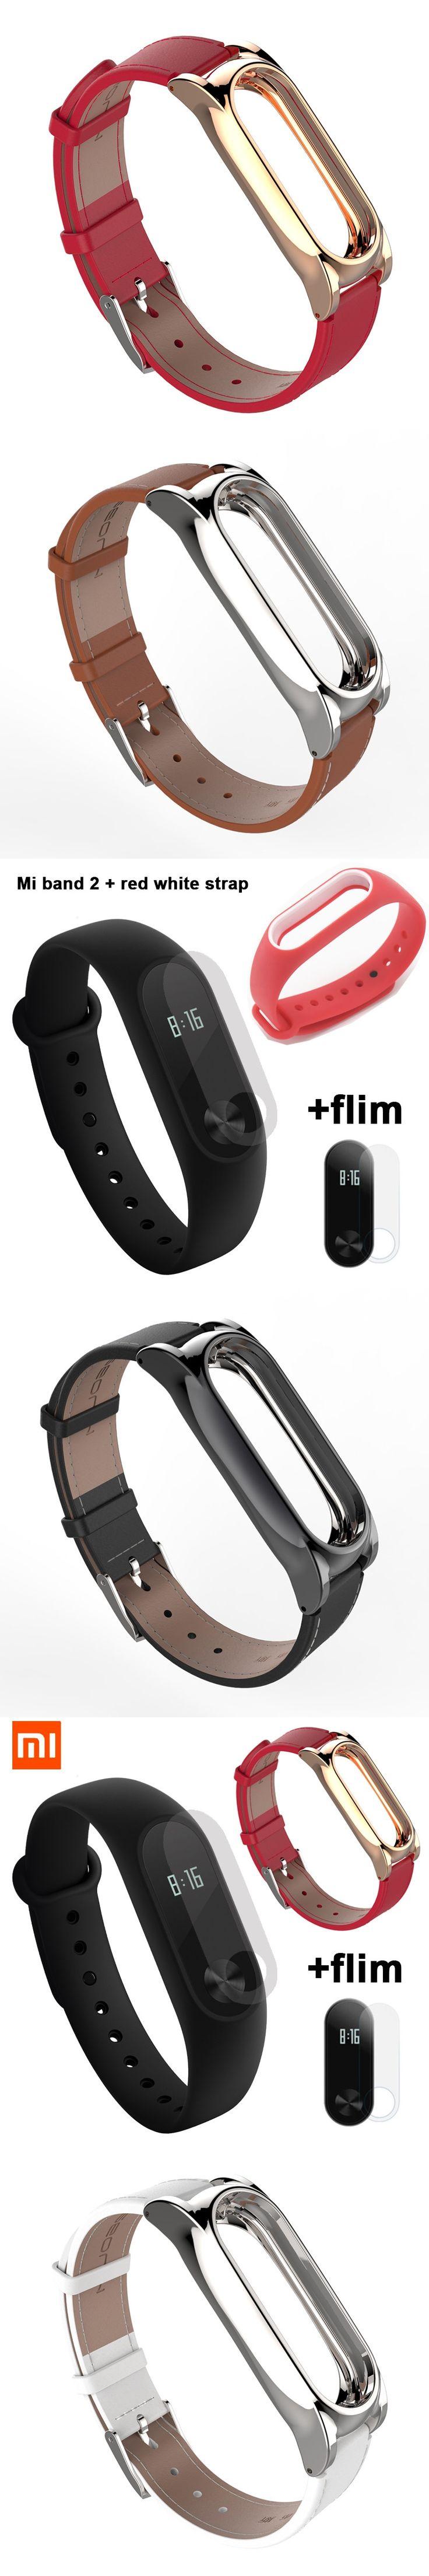 The 14 Best Alnacak Eyler Images On Pinterest Leather Bracelets Xiaomi Mi Band 2 Original Smart Bracelet Global With Passometer Activity Tracker Xaomi Fitness Watch For